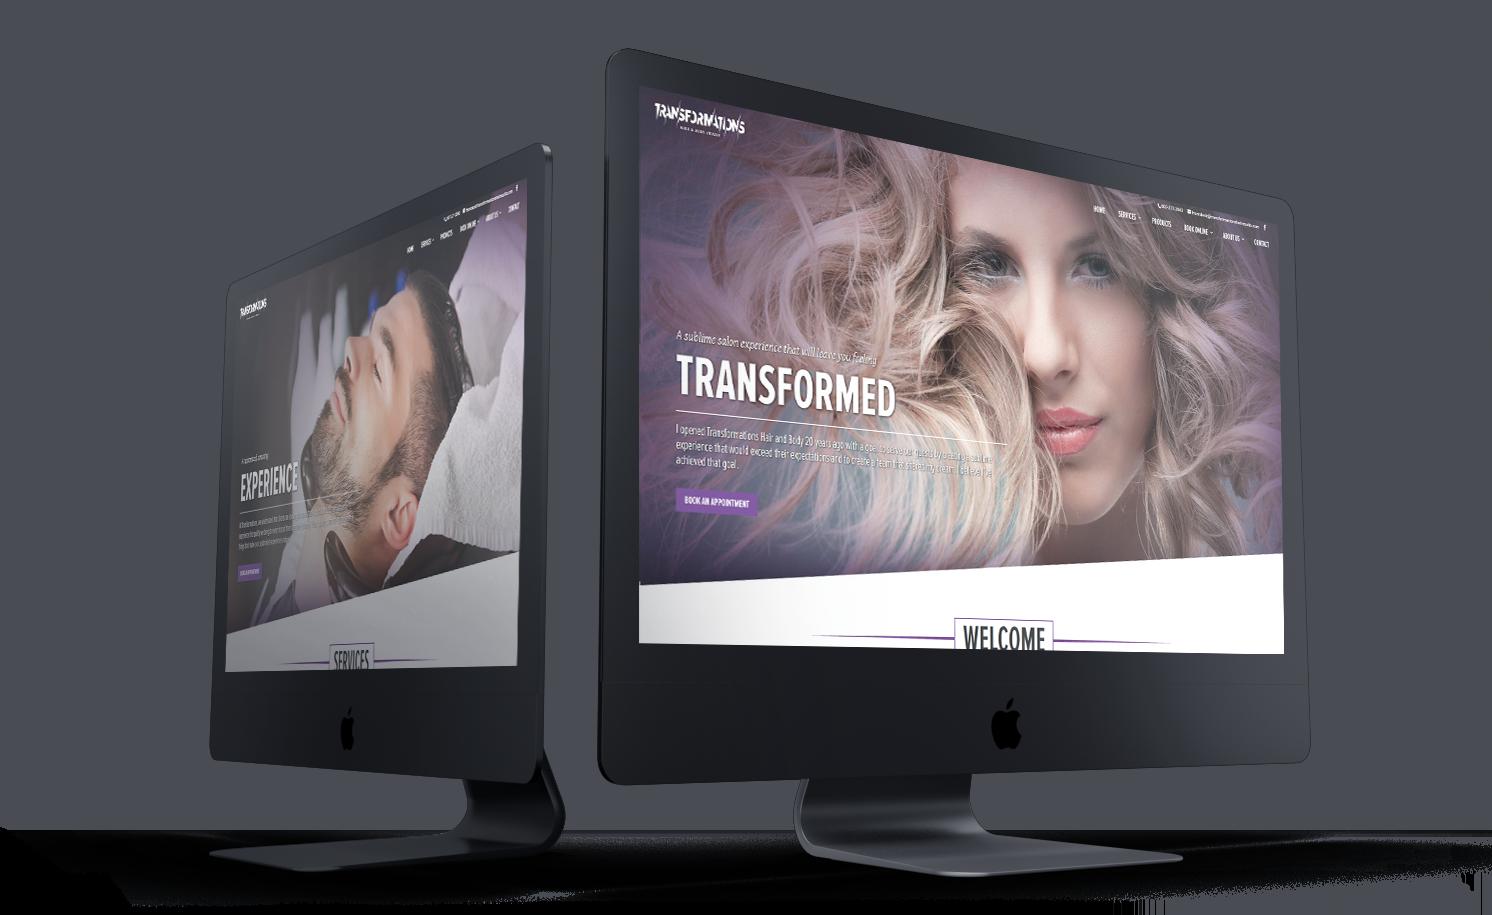 Award Winning Web Design Website Design Agency In Rochester Ny,Design Your Own Computer Case Online